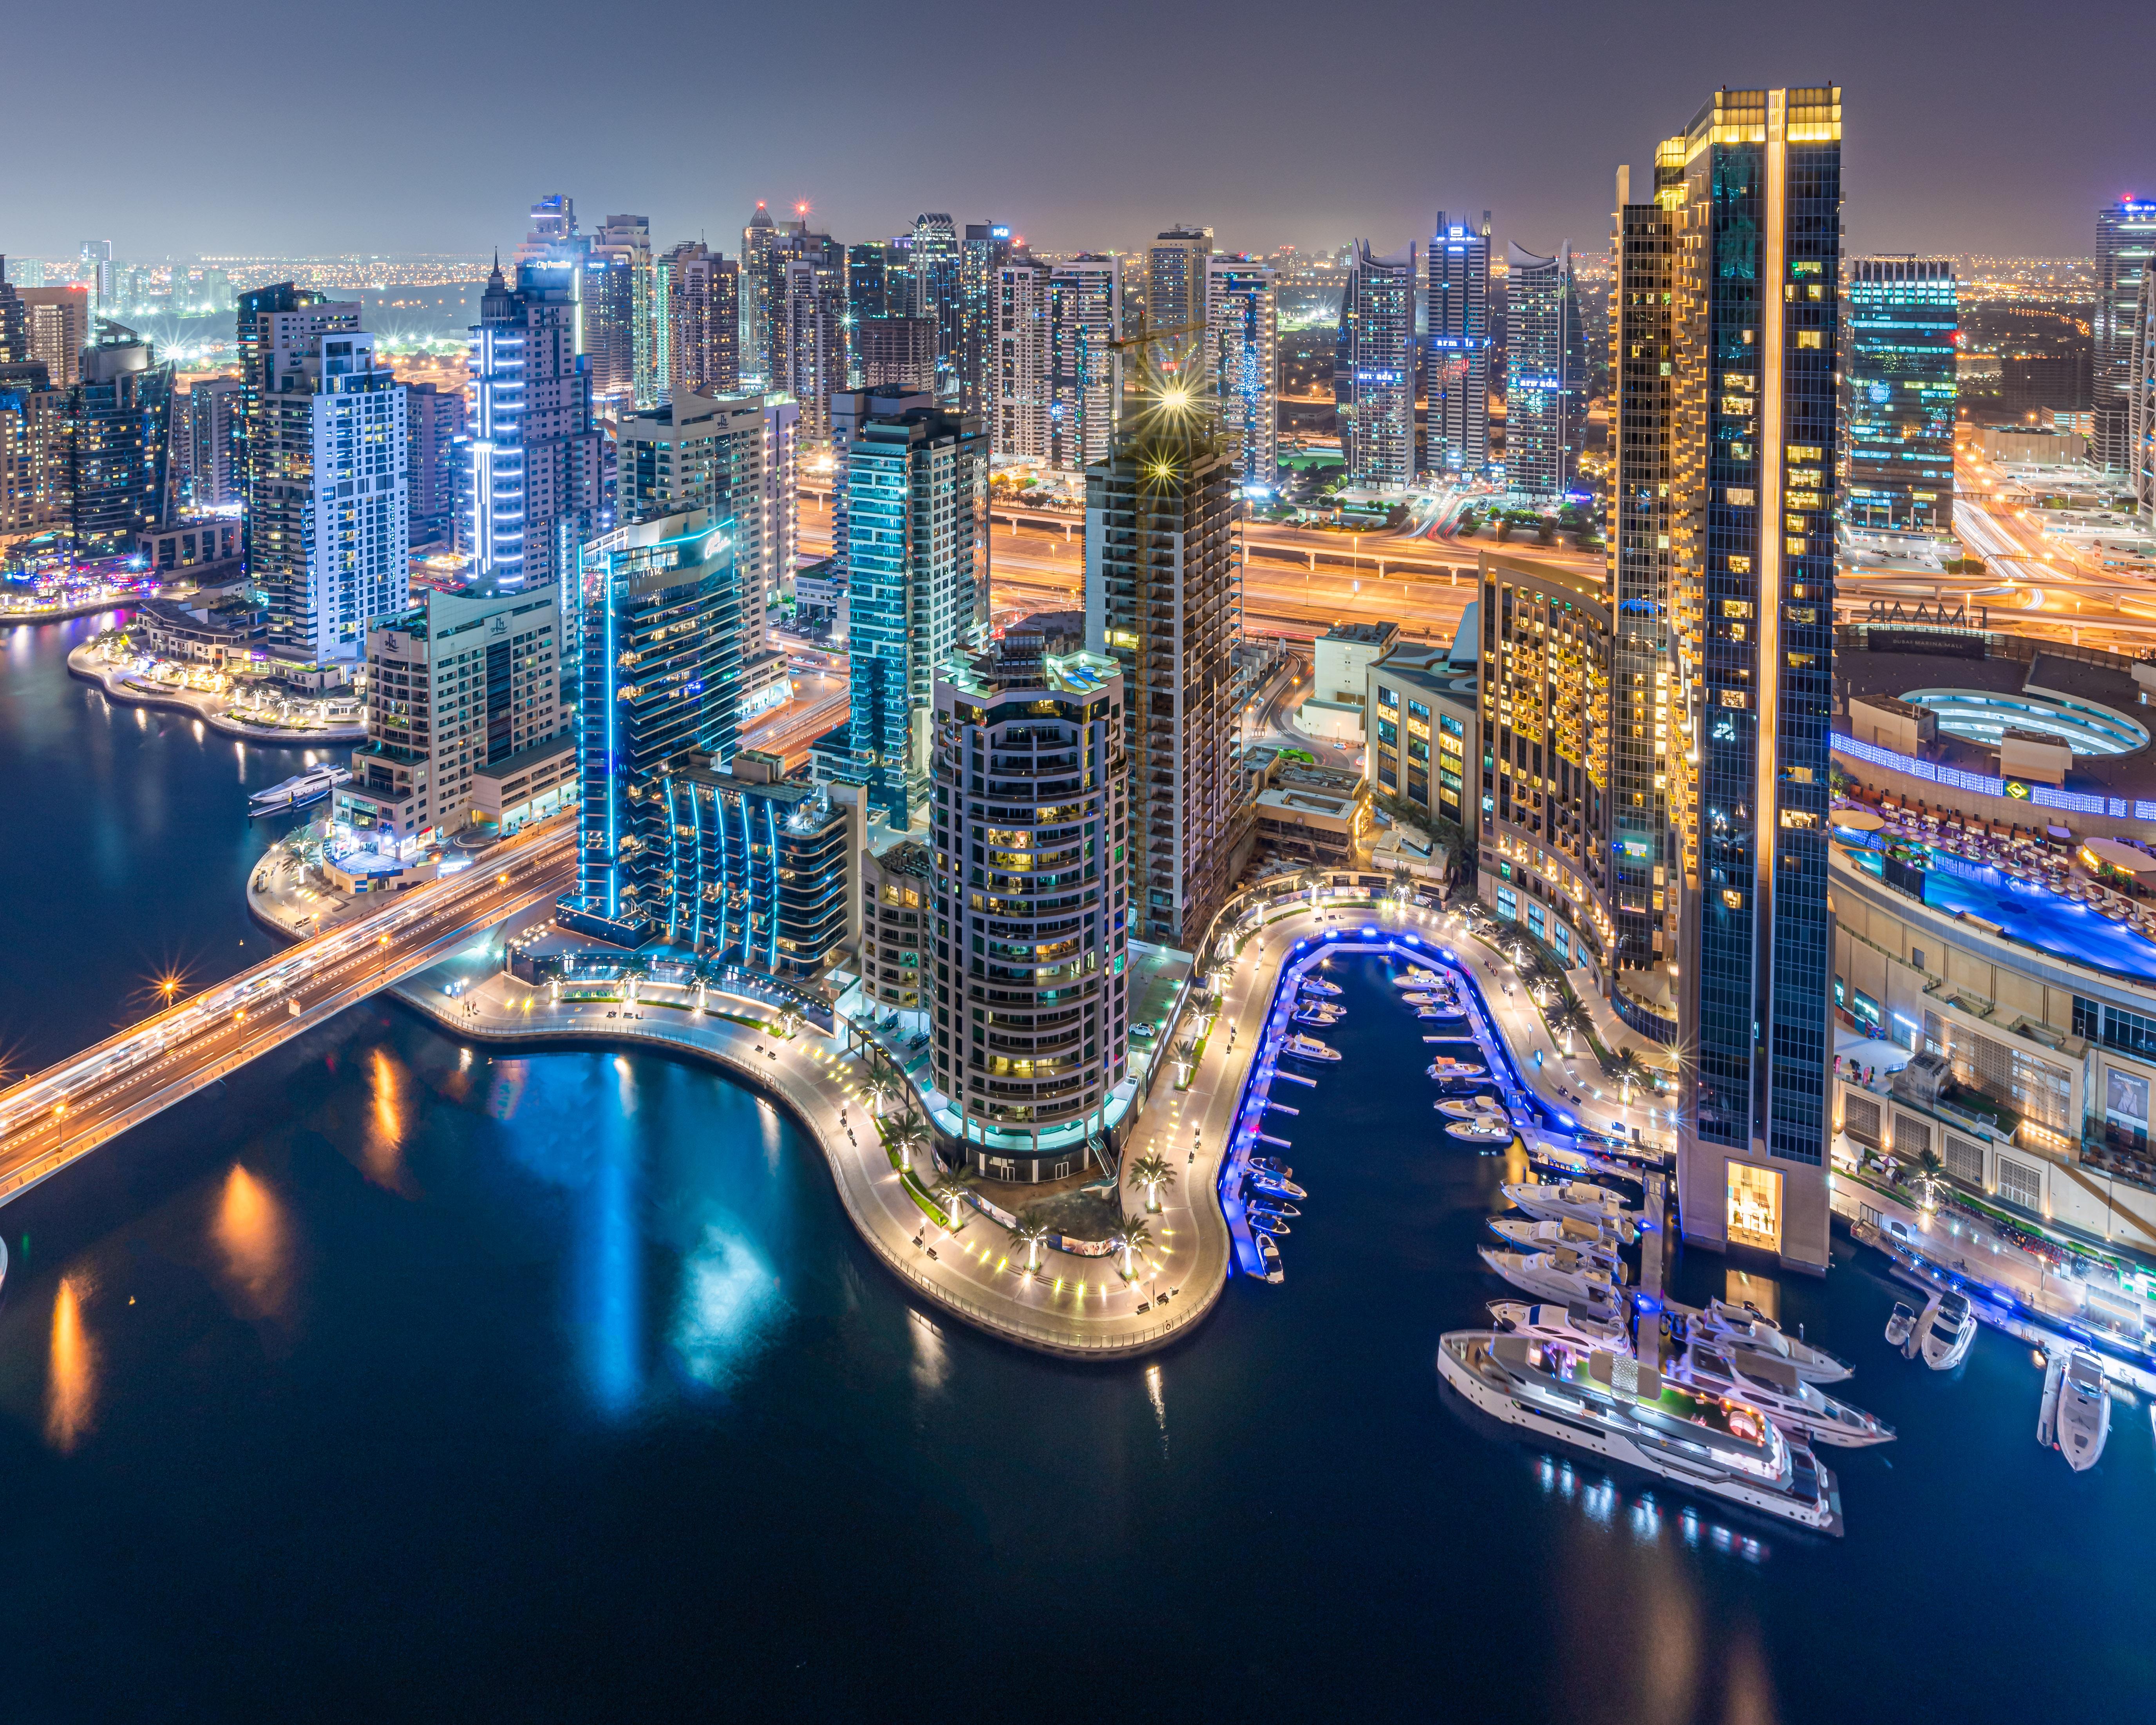 The classic shots from Intercontinental Dubai Marina